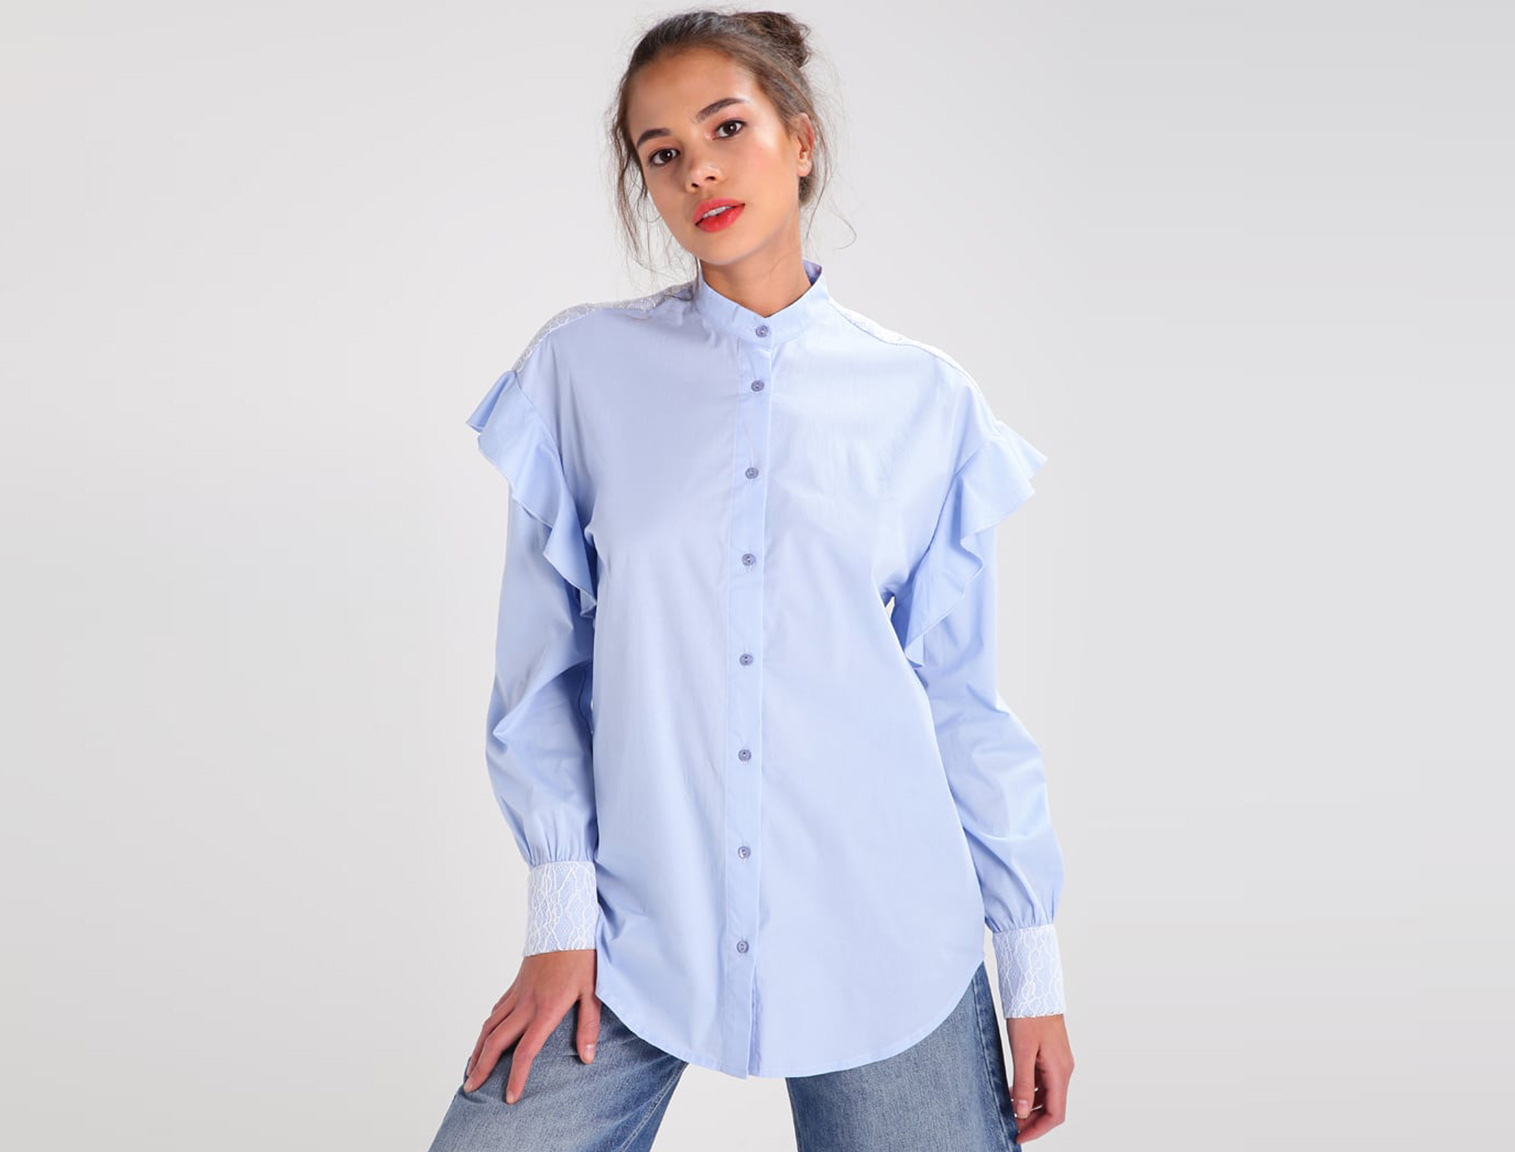 03933188c16fc Mujer con camisa cuello mao azul